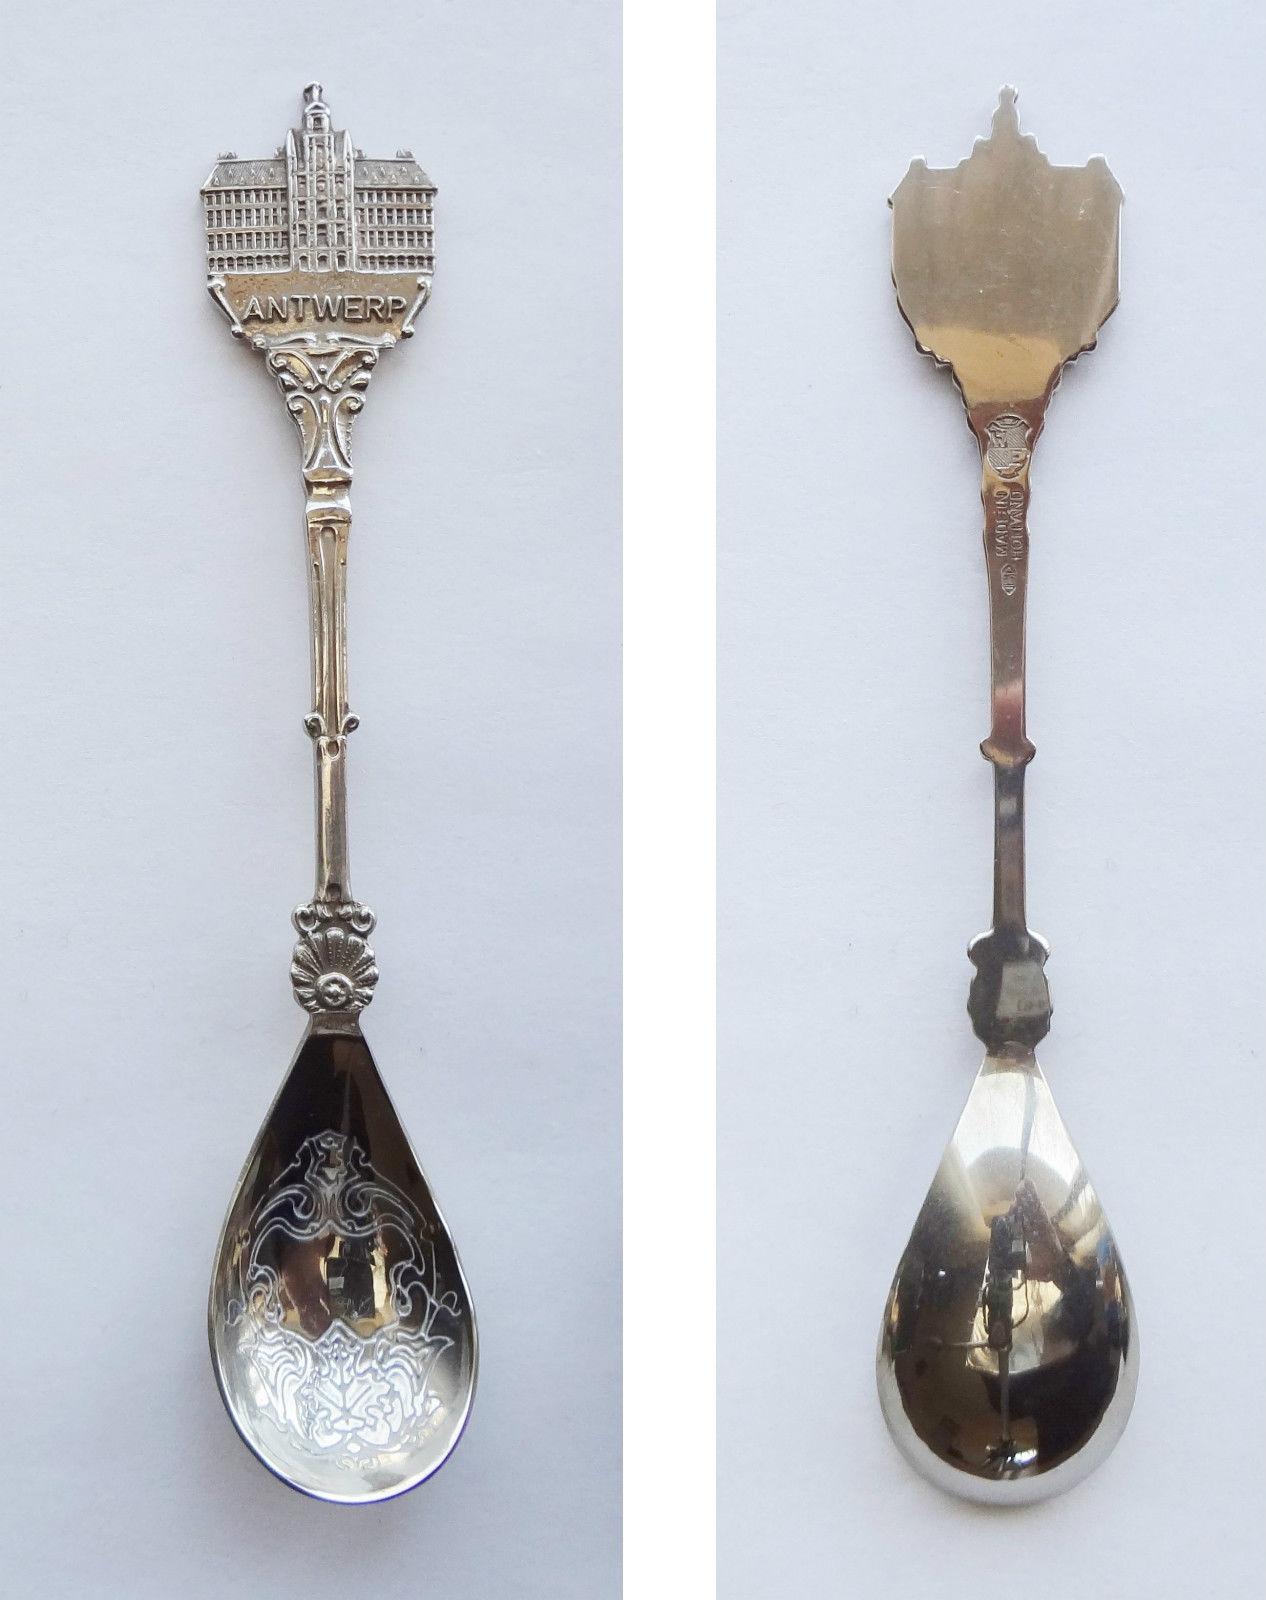 Collector Souvenir Spoon Belgium Antwerp Grote Market City Hall Figural Teardrop